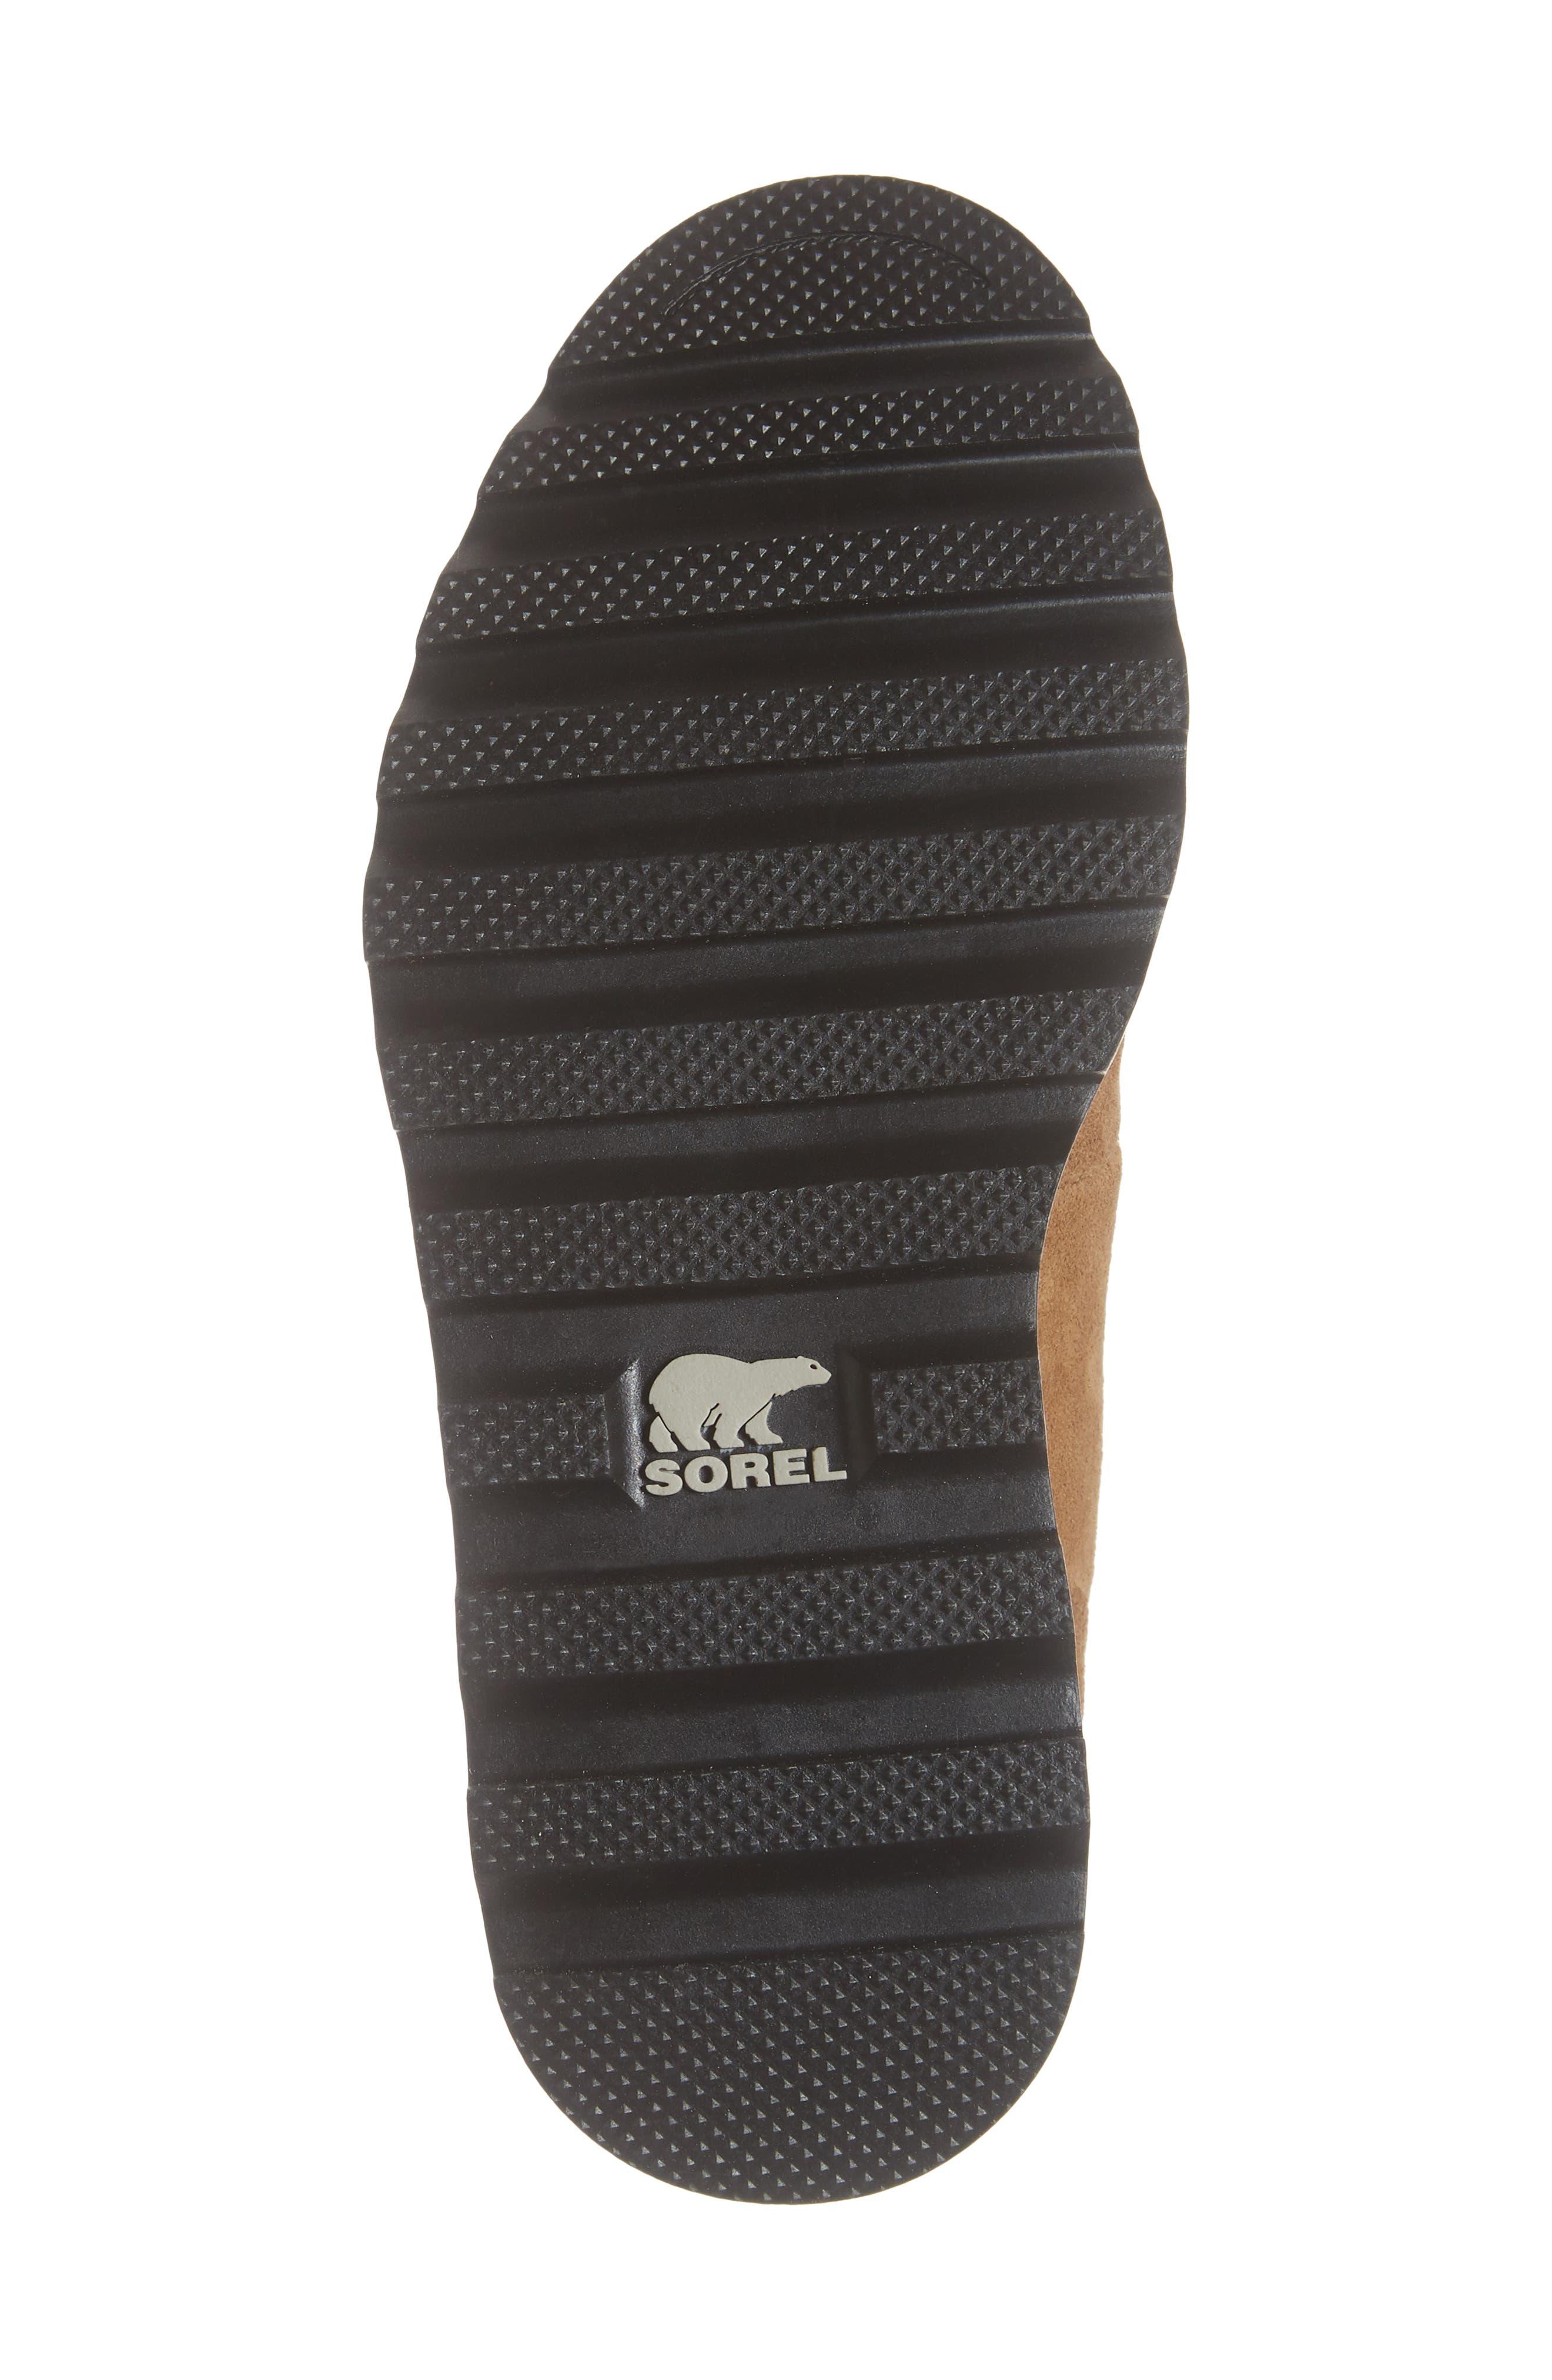 Madison Waterproof Hiker Boot,                             Alternate thumbnail 6, color,                             CAMEL BROWN/ BLACK